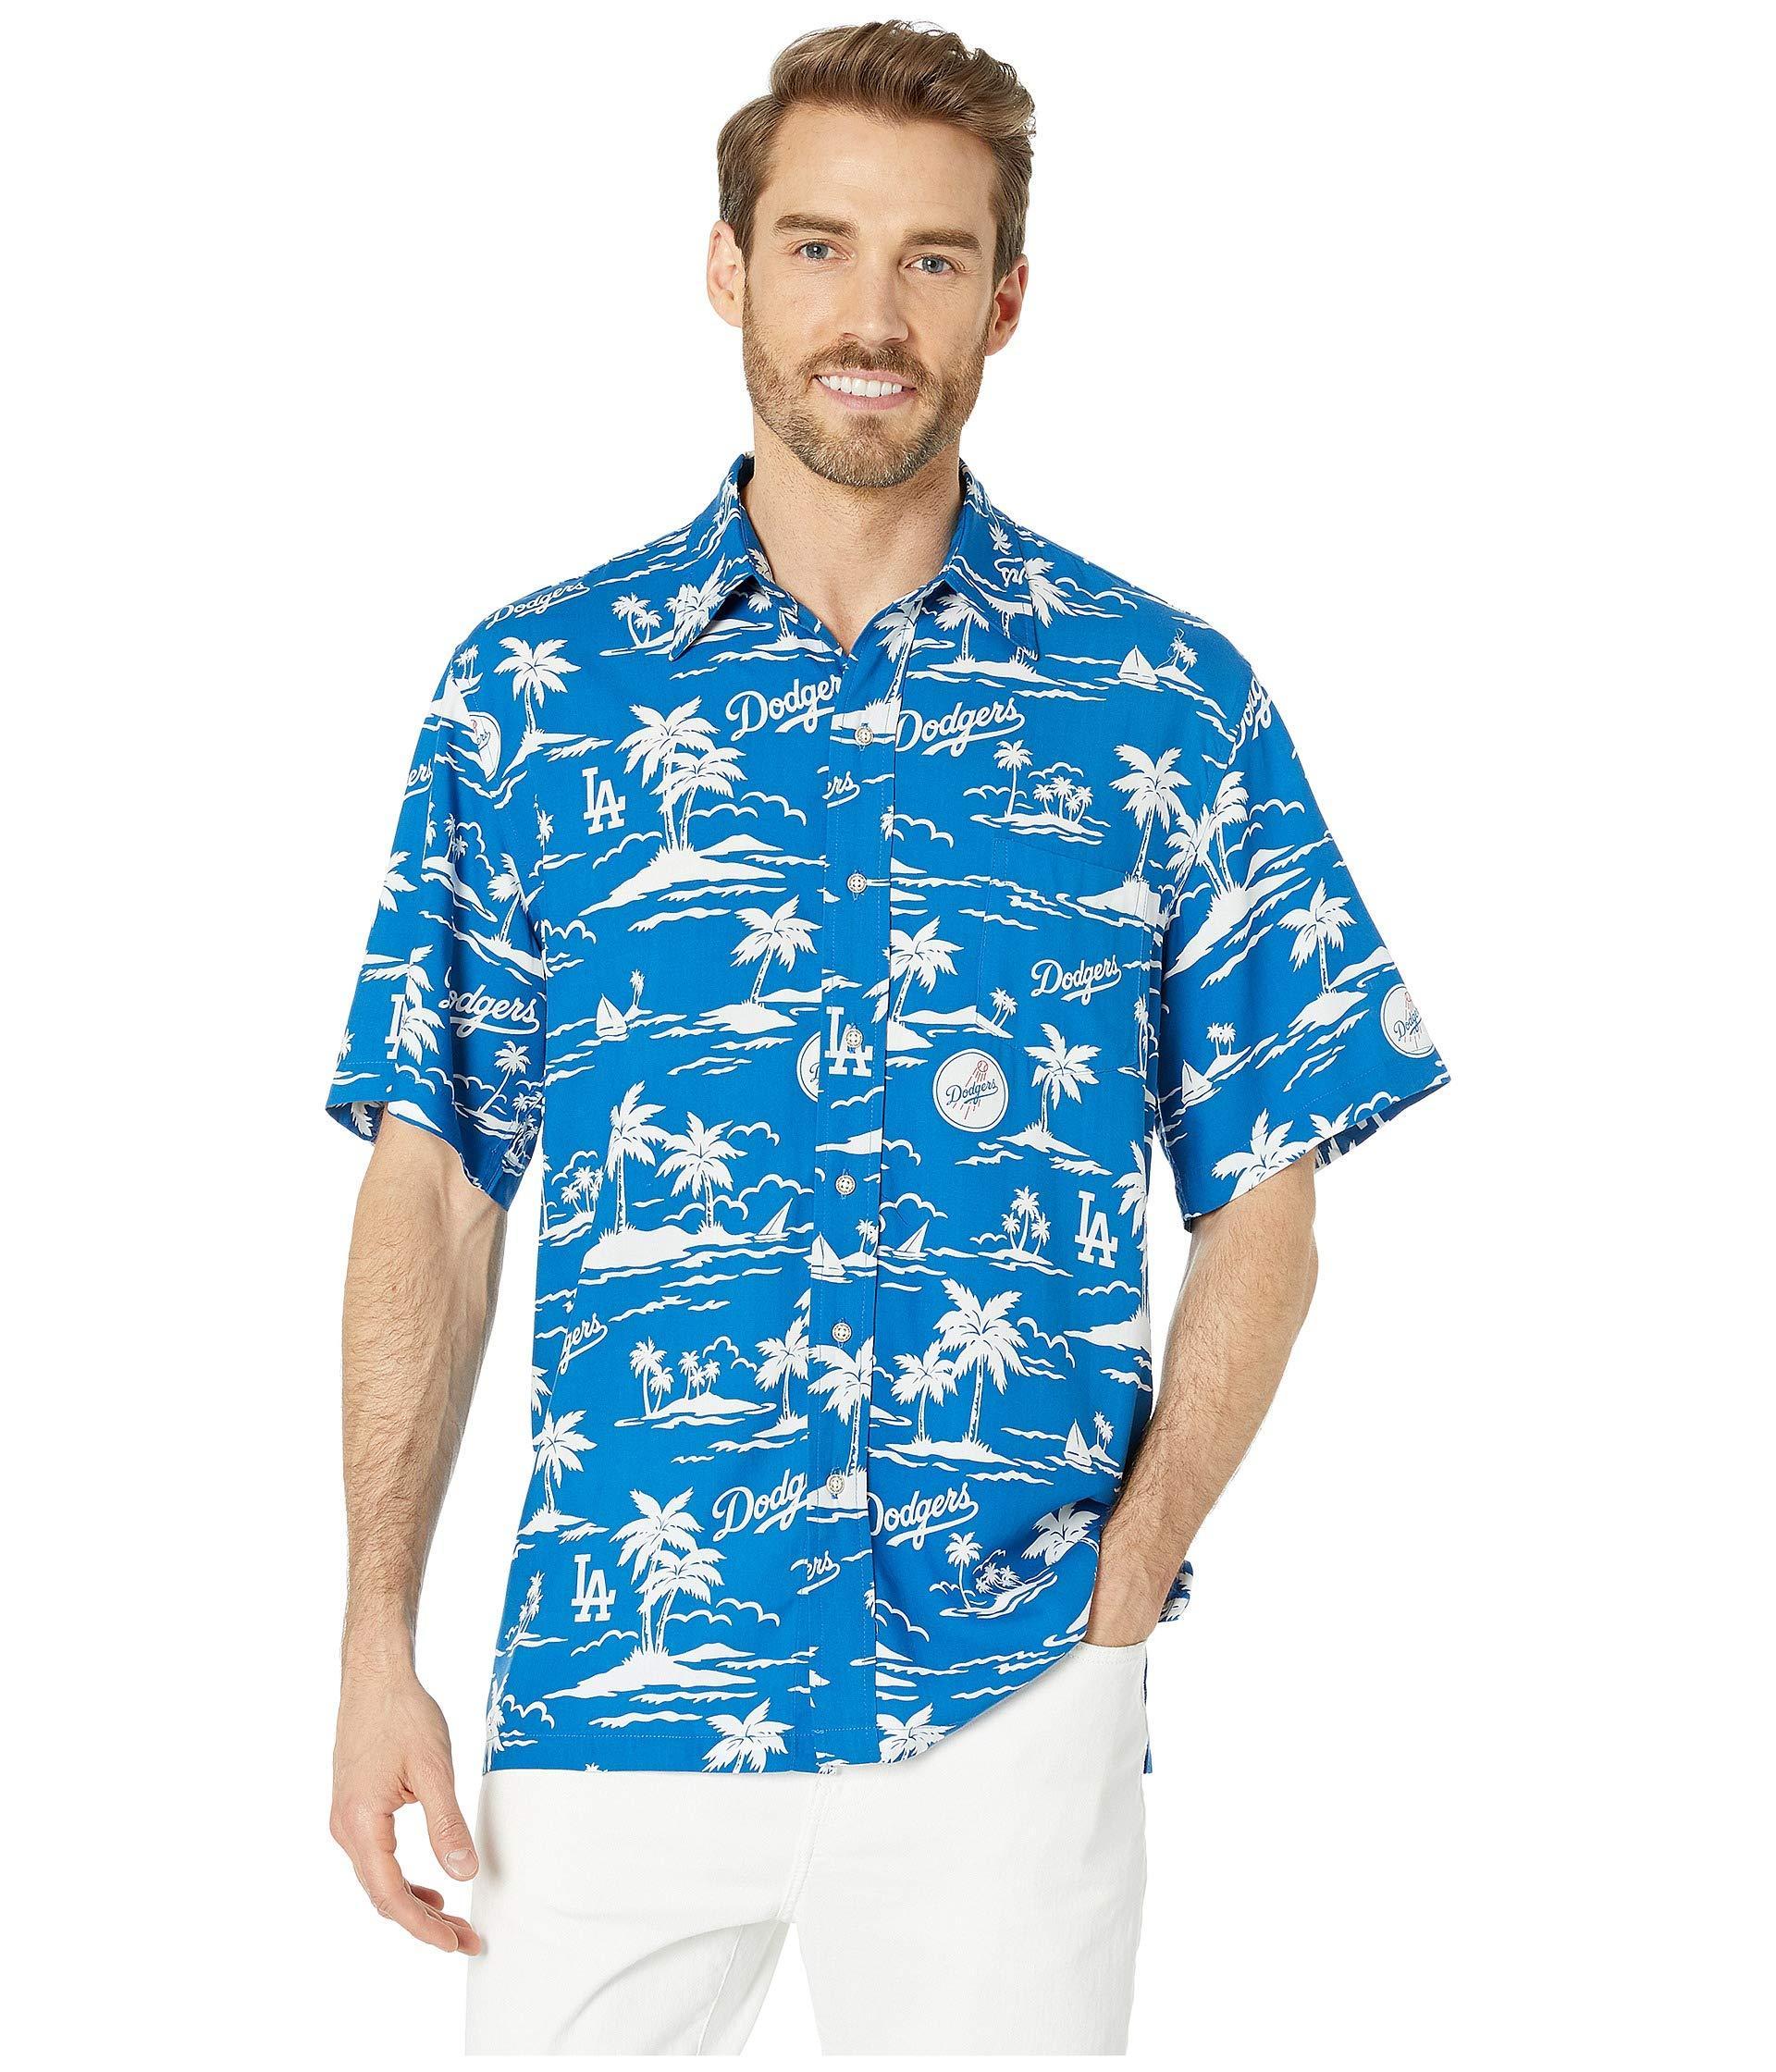 708e31541 Reyn Spooner - La Dodgers Vintage Rayon Shirt (blue) Men's Clothing for Men  -. View fullscreen